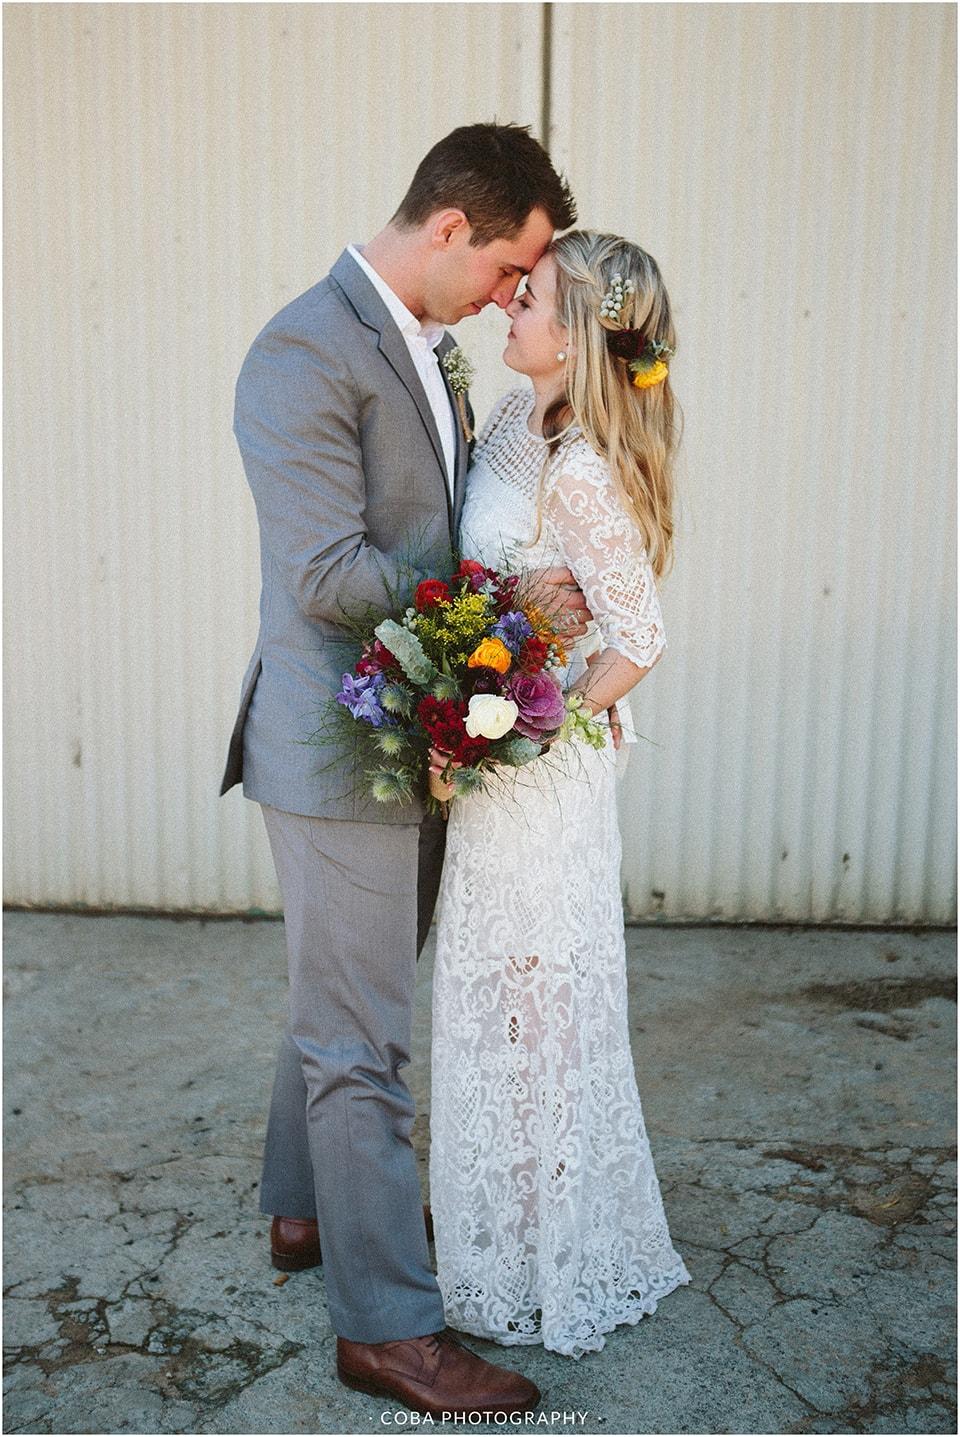 David & Marlize - Opstal - Wedding Photographer (152)